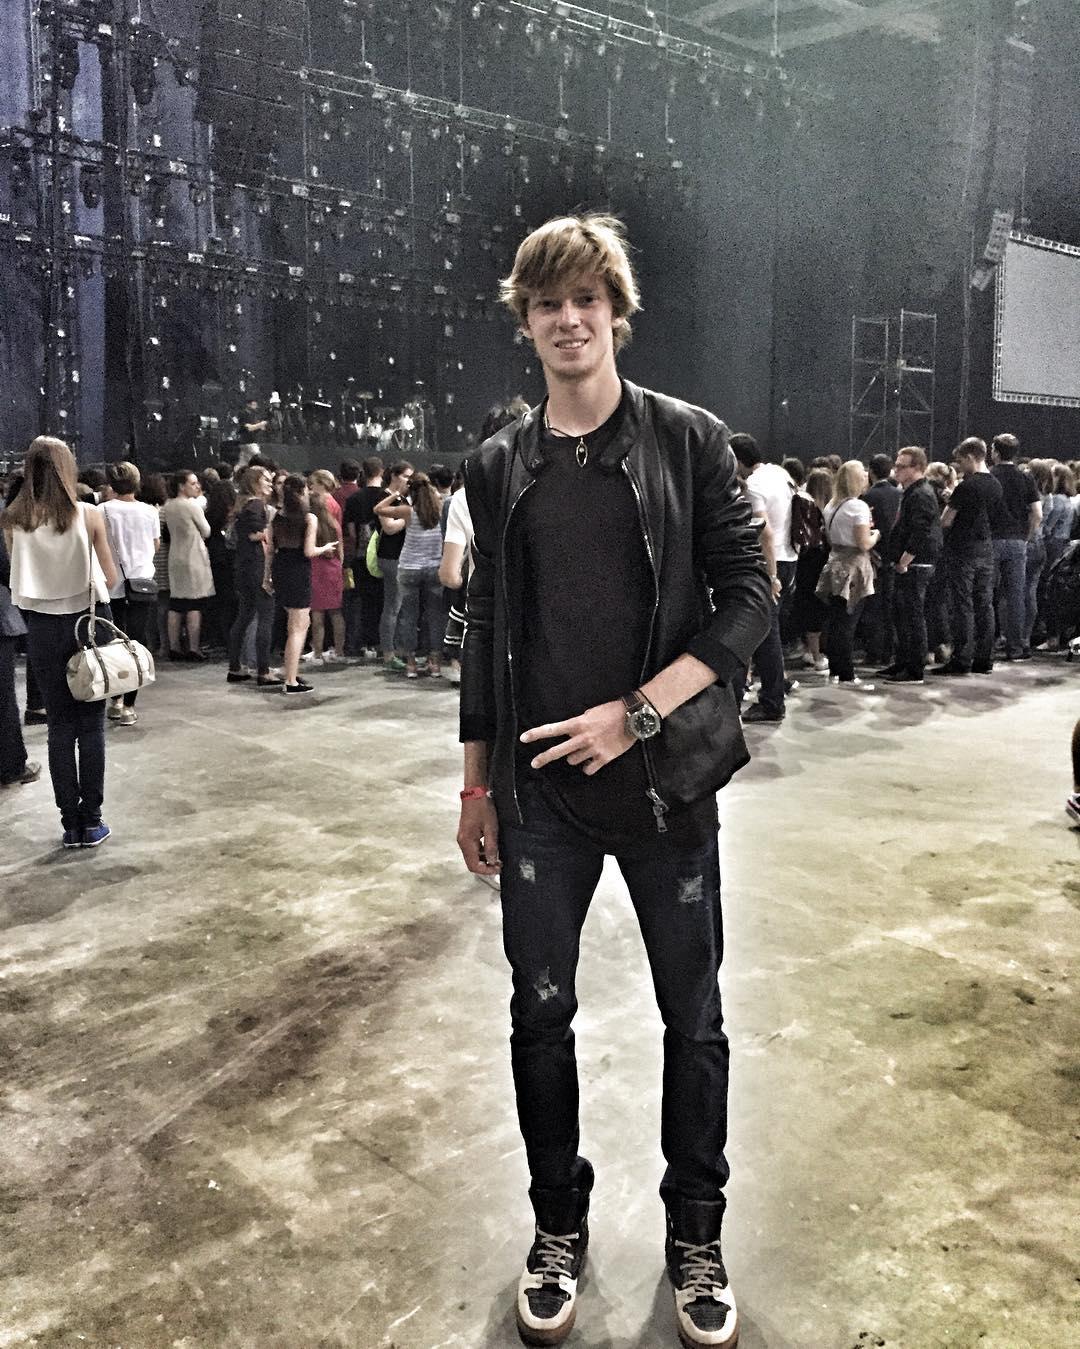 Андрей Рублев на концерте Maroon 5 в Москве